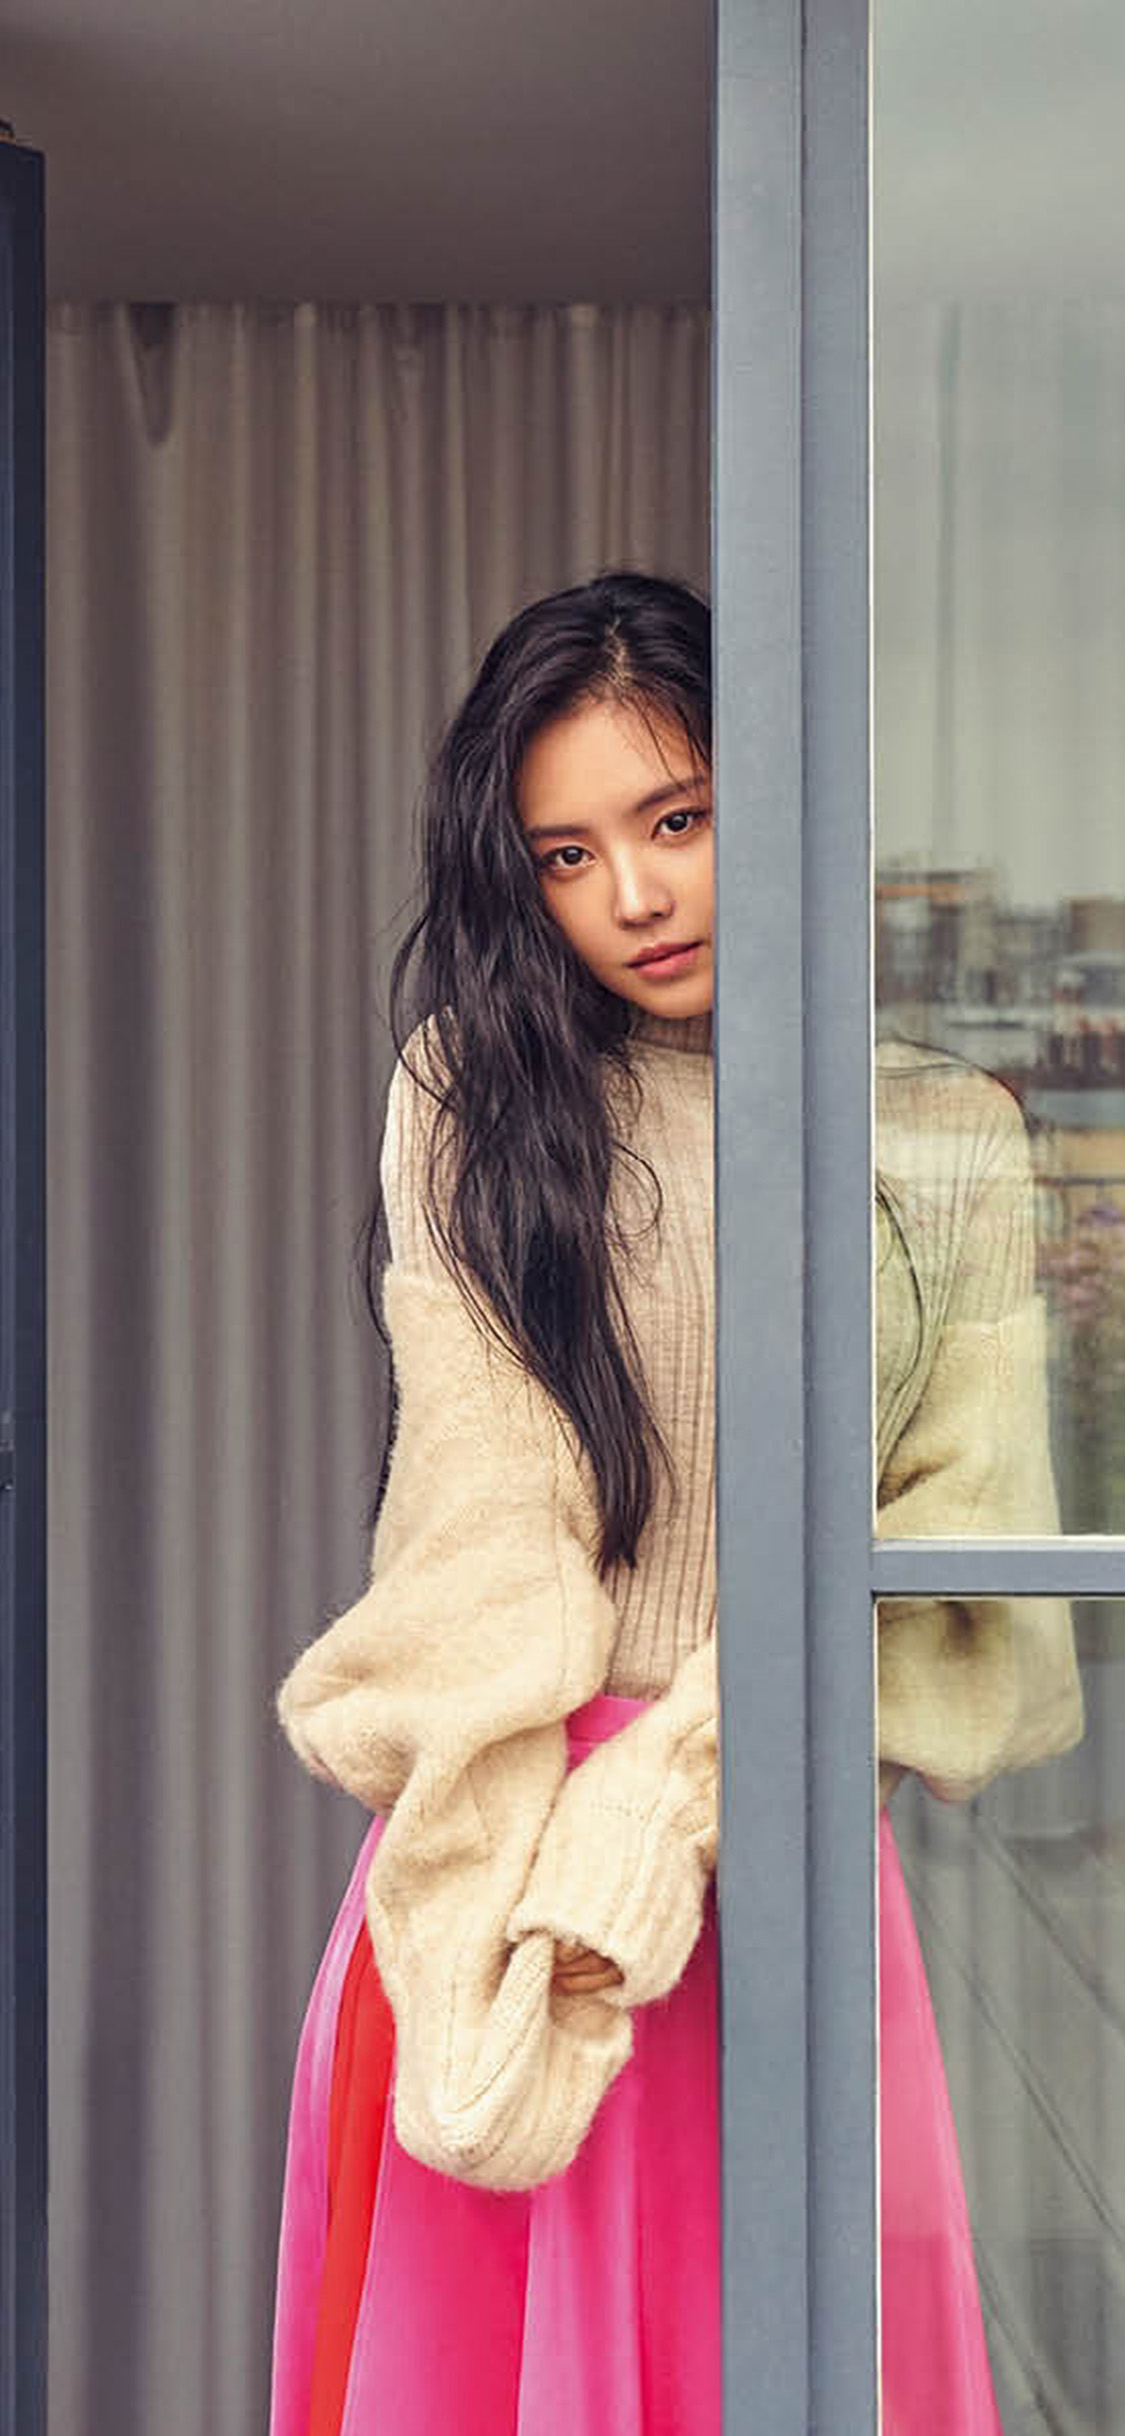 iPhonexpapers.com-Apple-iPhone-wallpaper-hr17-girl-gaze-kpop-skirt